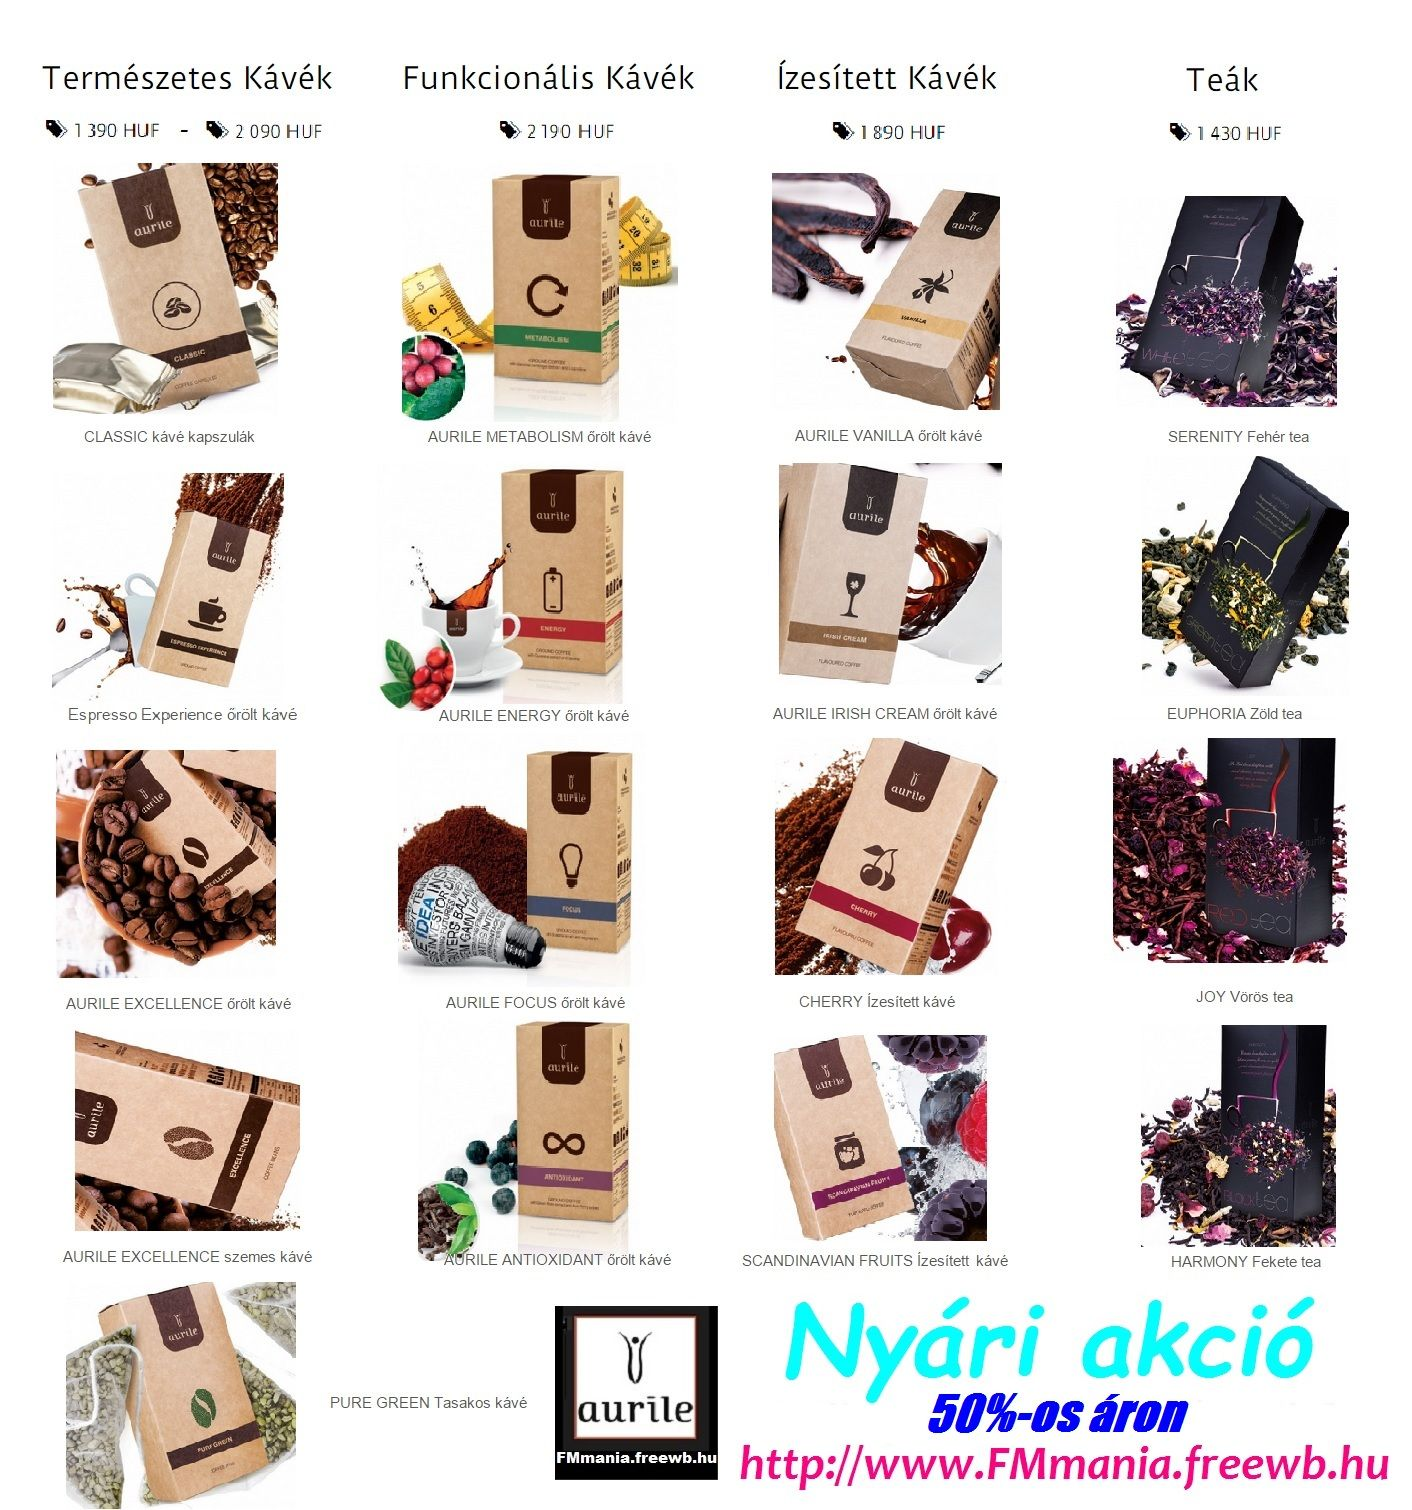 kávéink